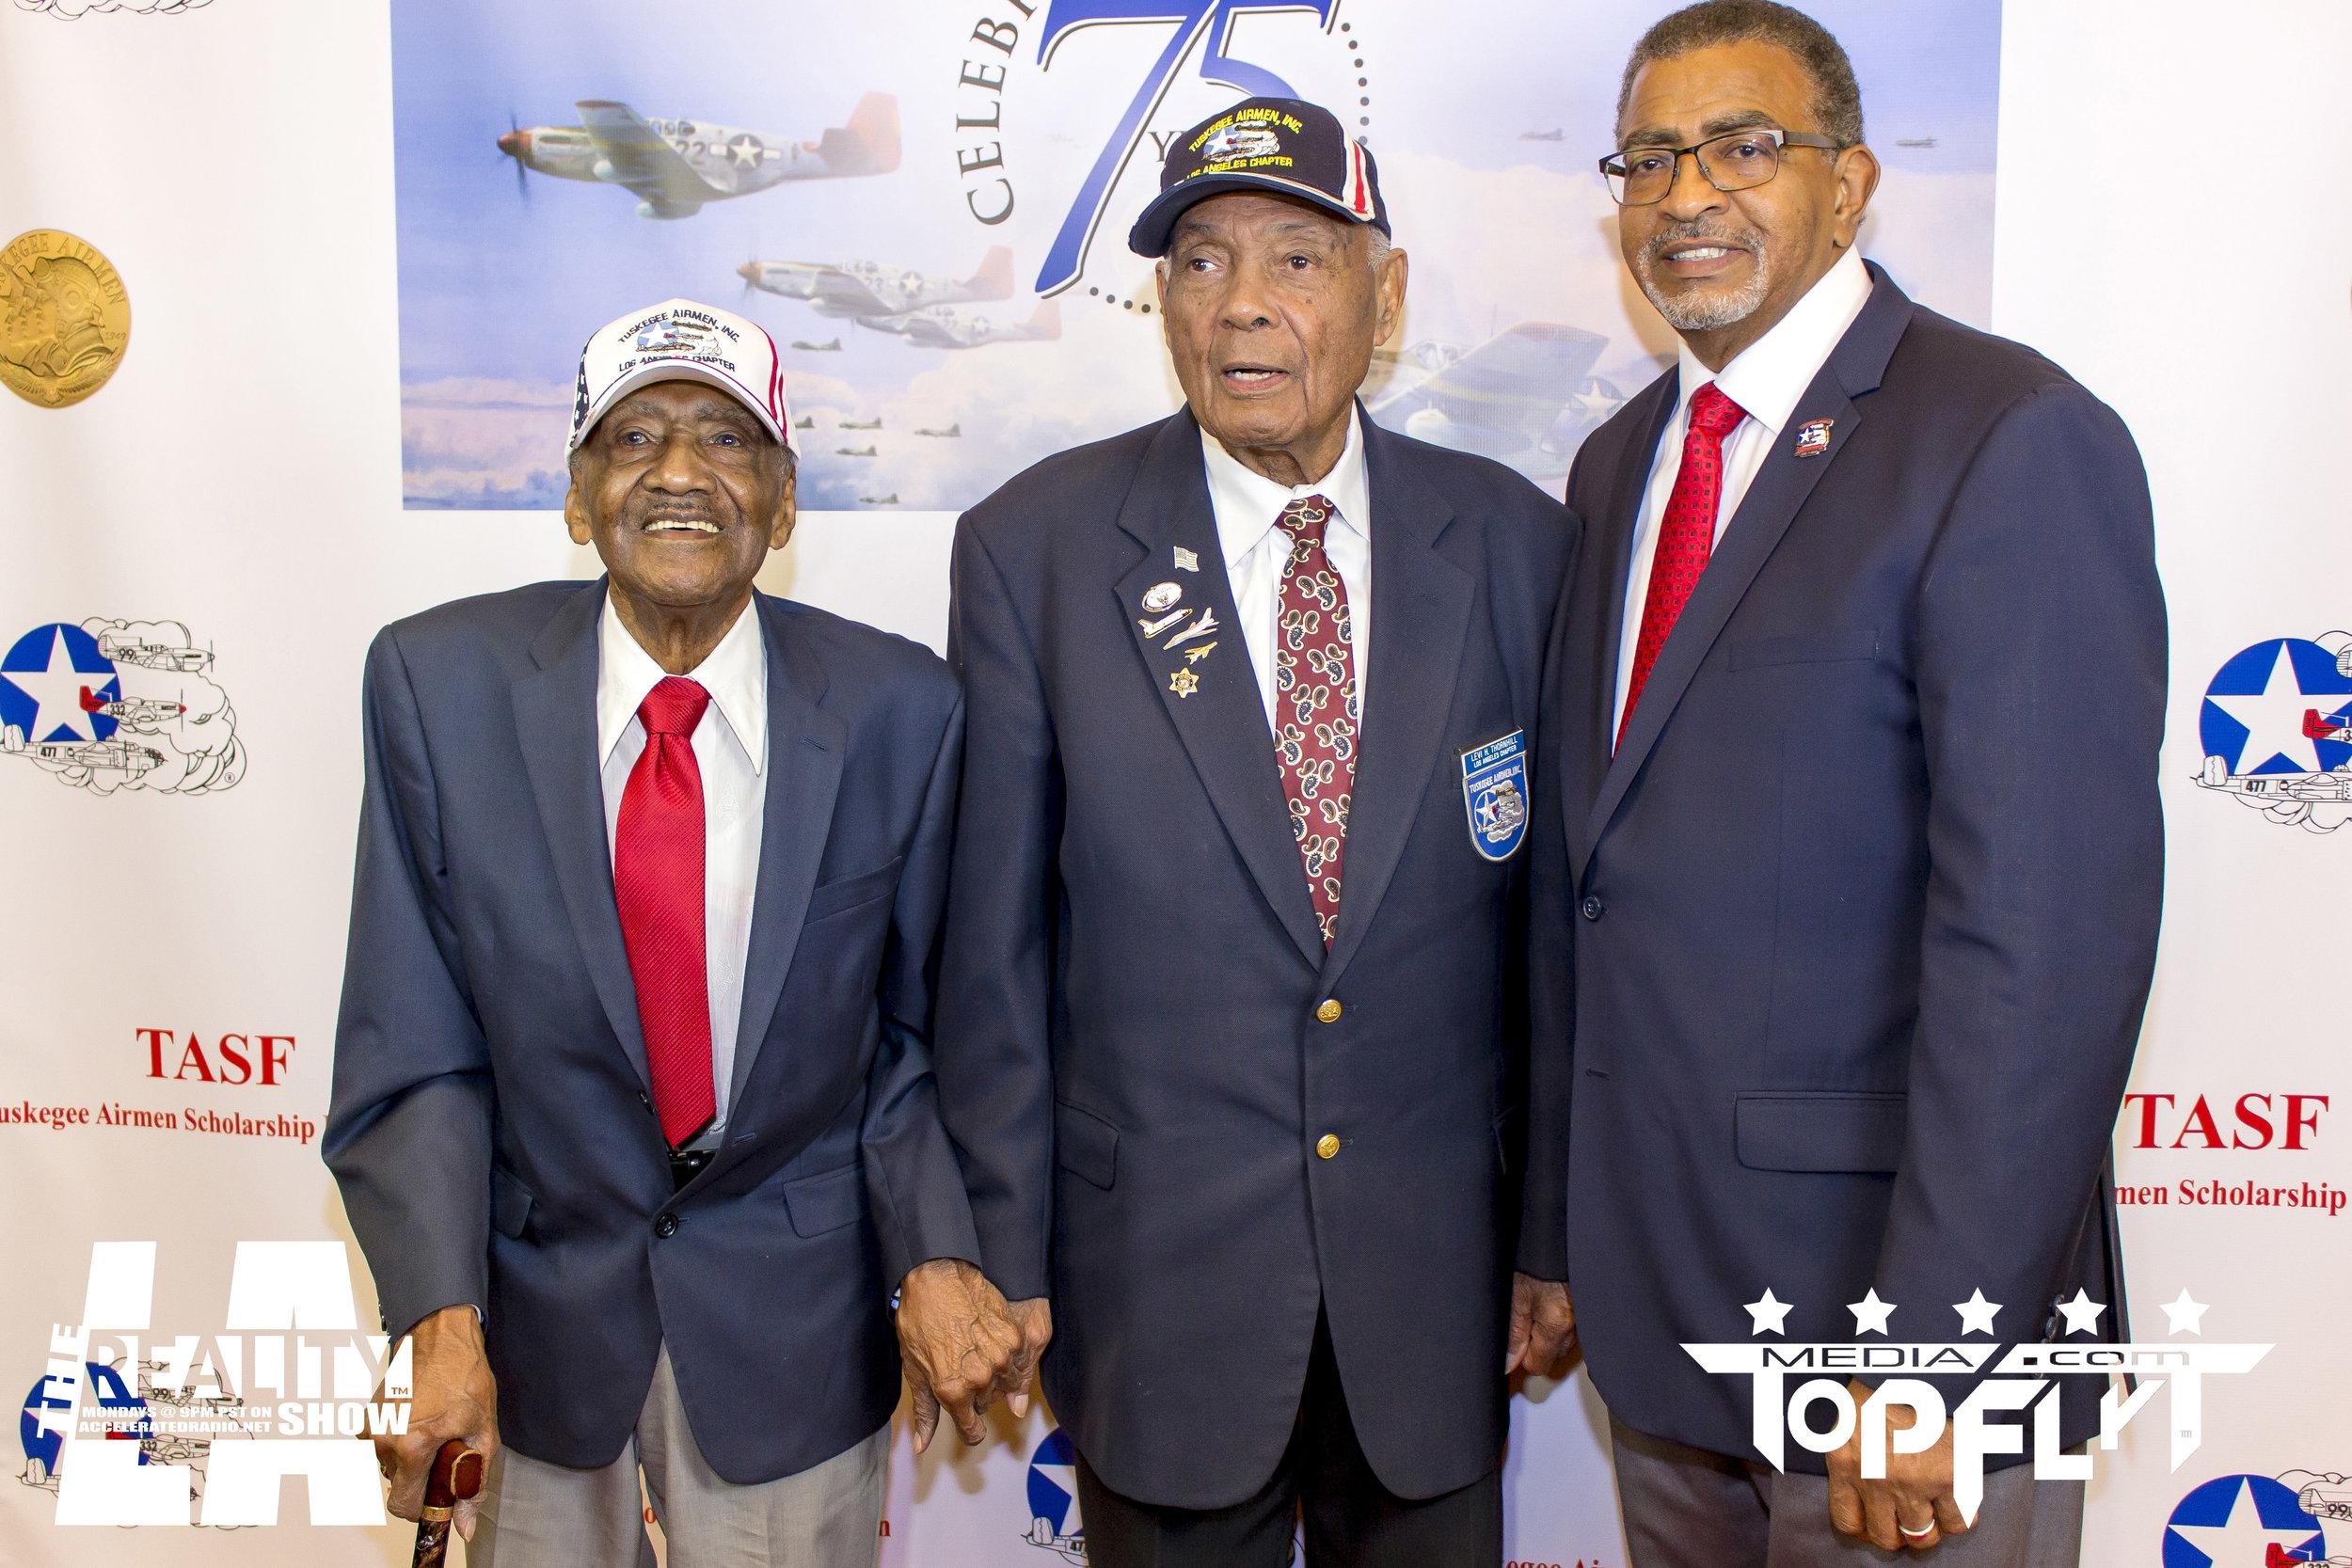 The Reality Show LA - Tuskegee Airmen 75th Anniversary VIP Reception_20.jpg